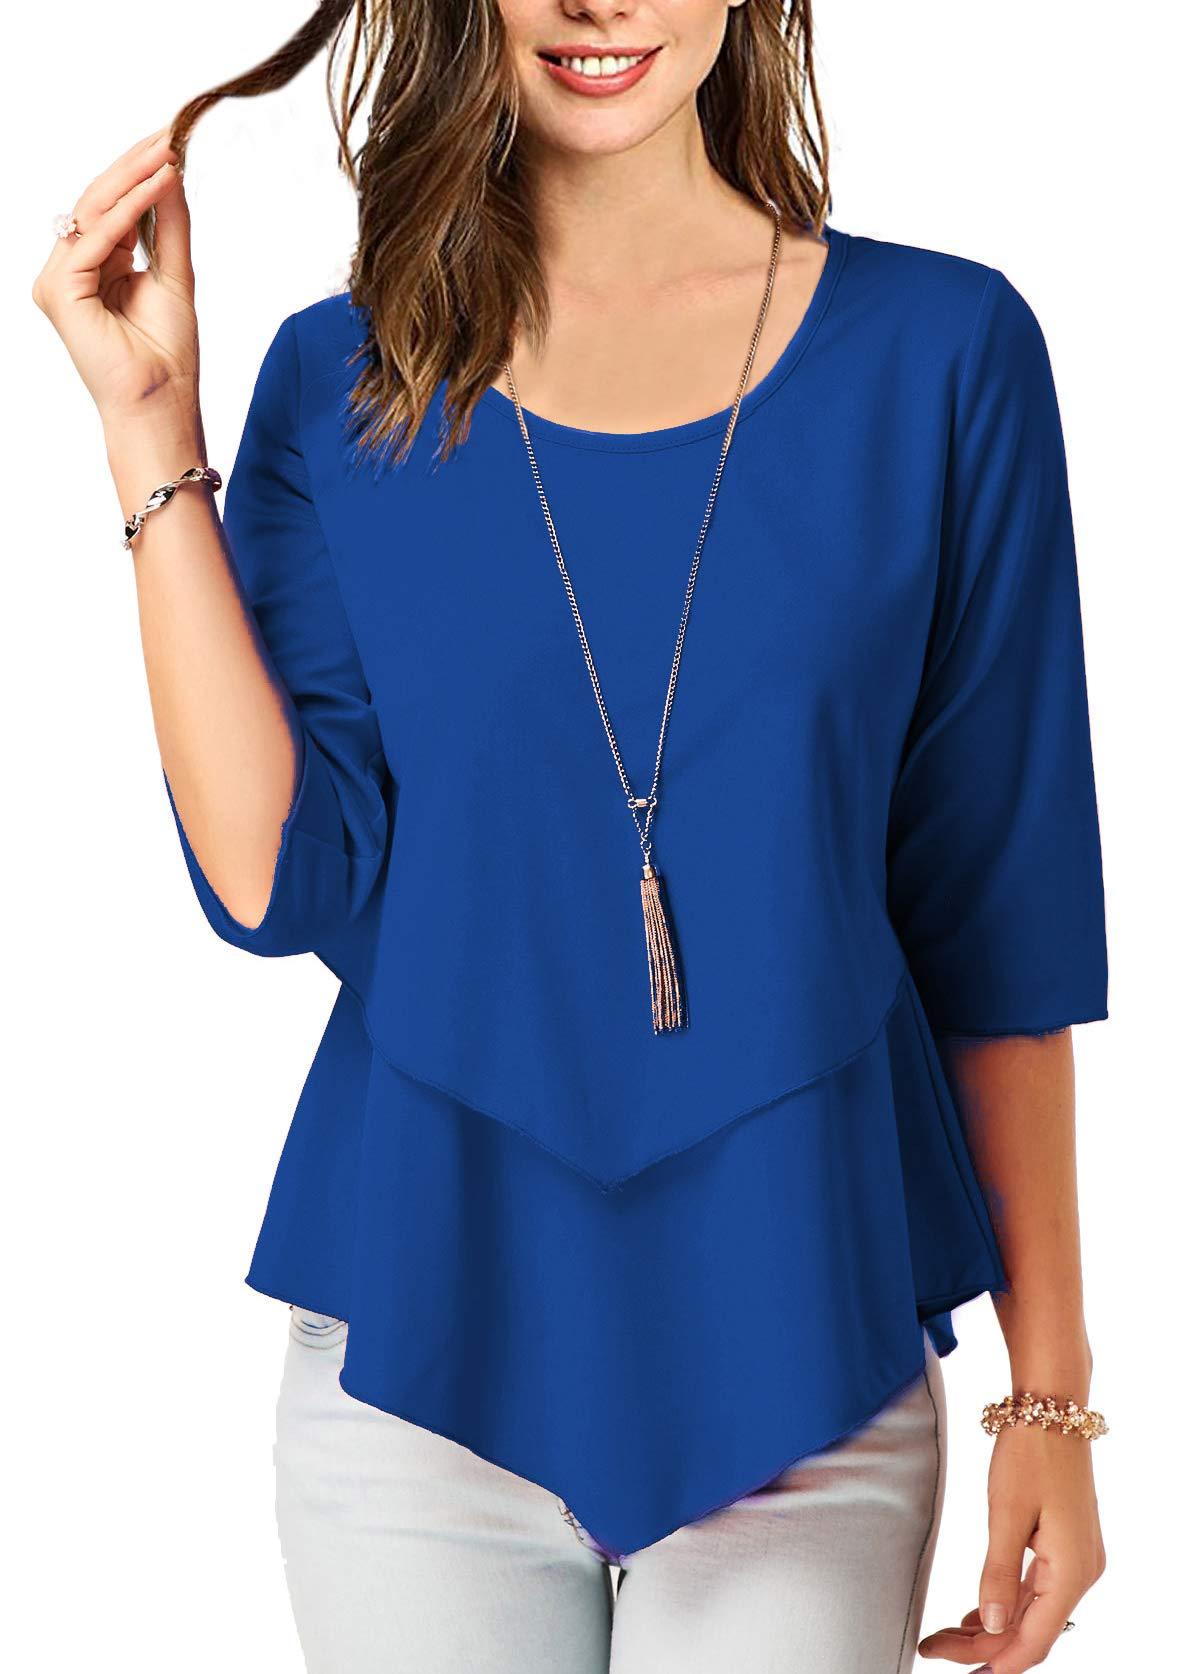 BETTE BOUTIK Women's Half-Sleeves Elegant Work T-Shirt Tops Classic Style Blue Small